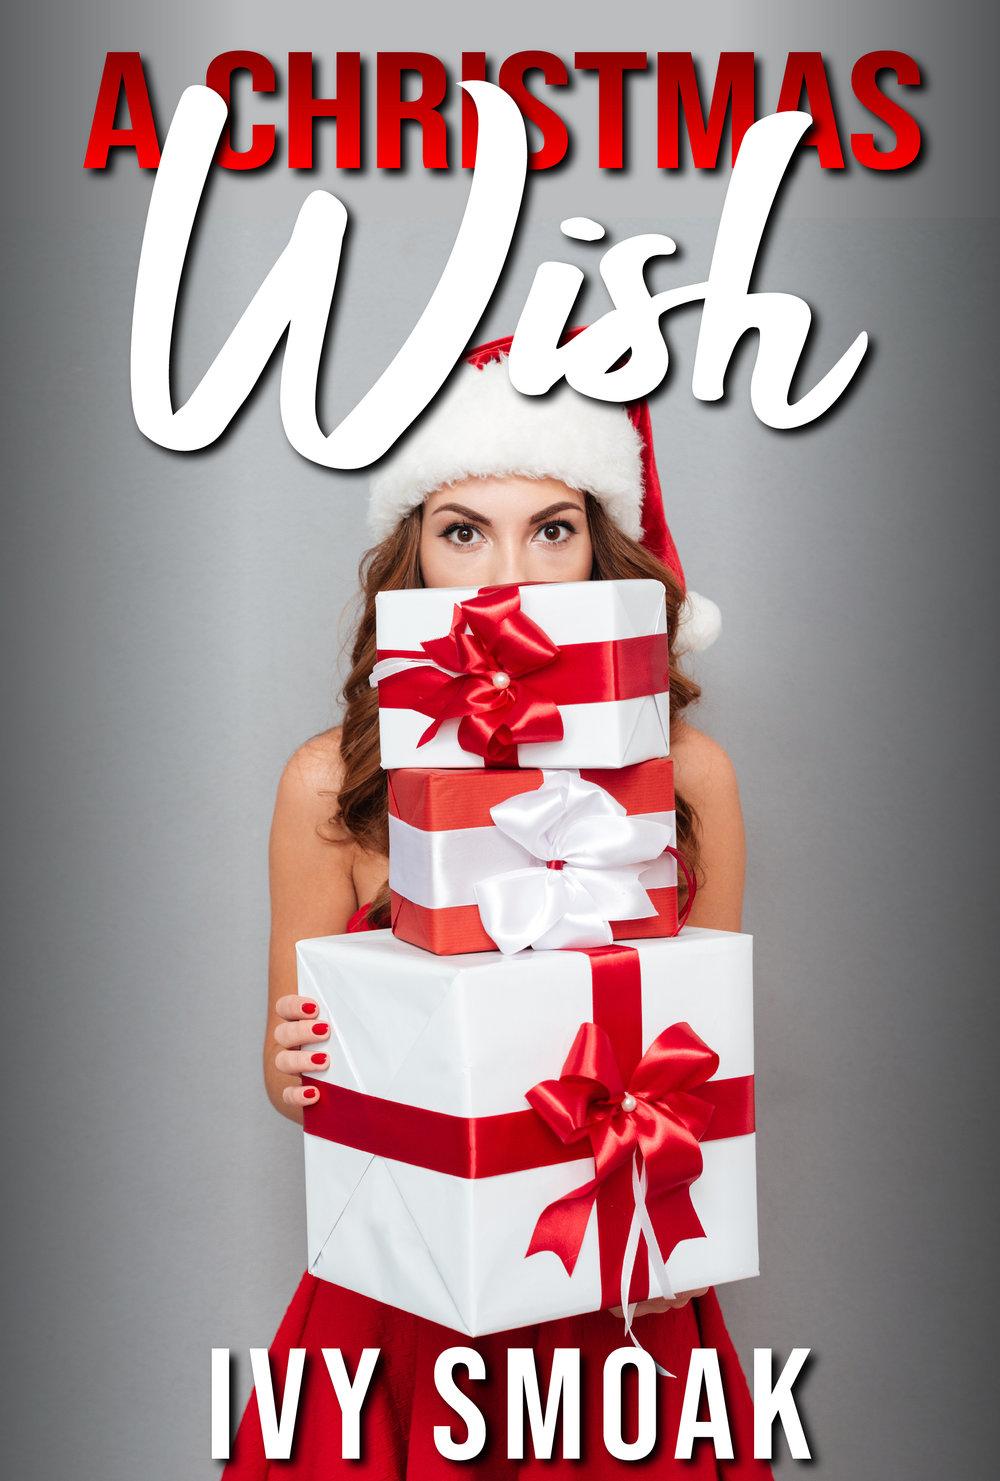 A Christmas Wish Cover V2.jpg